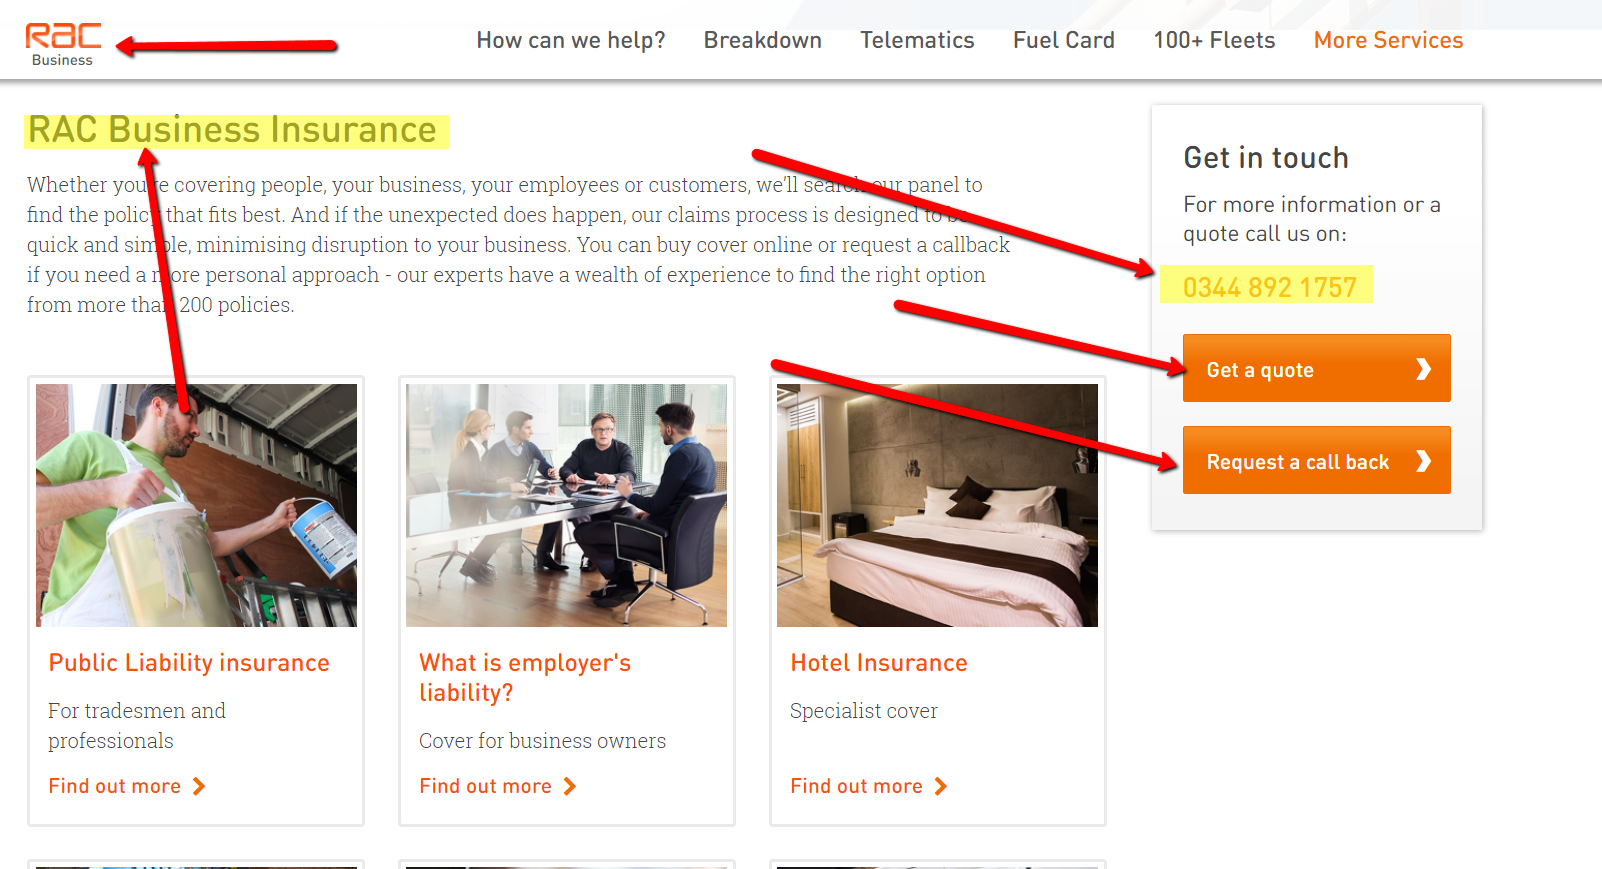 RAC Business Insurance